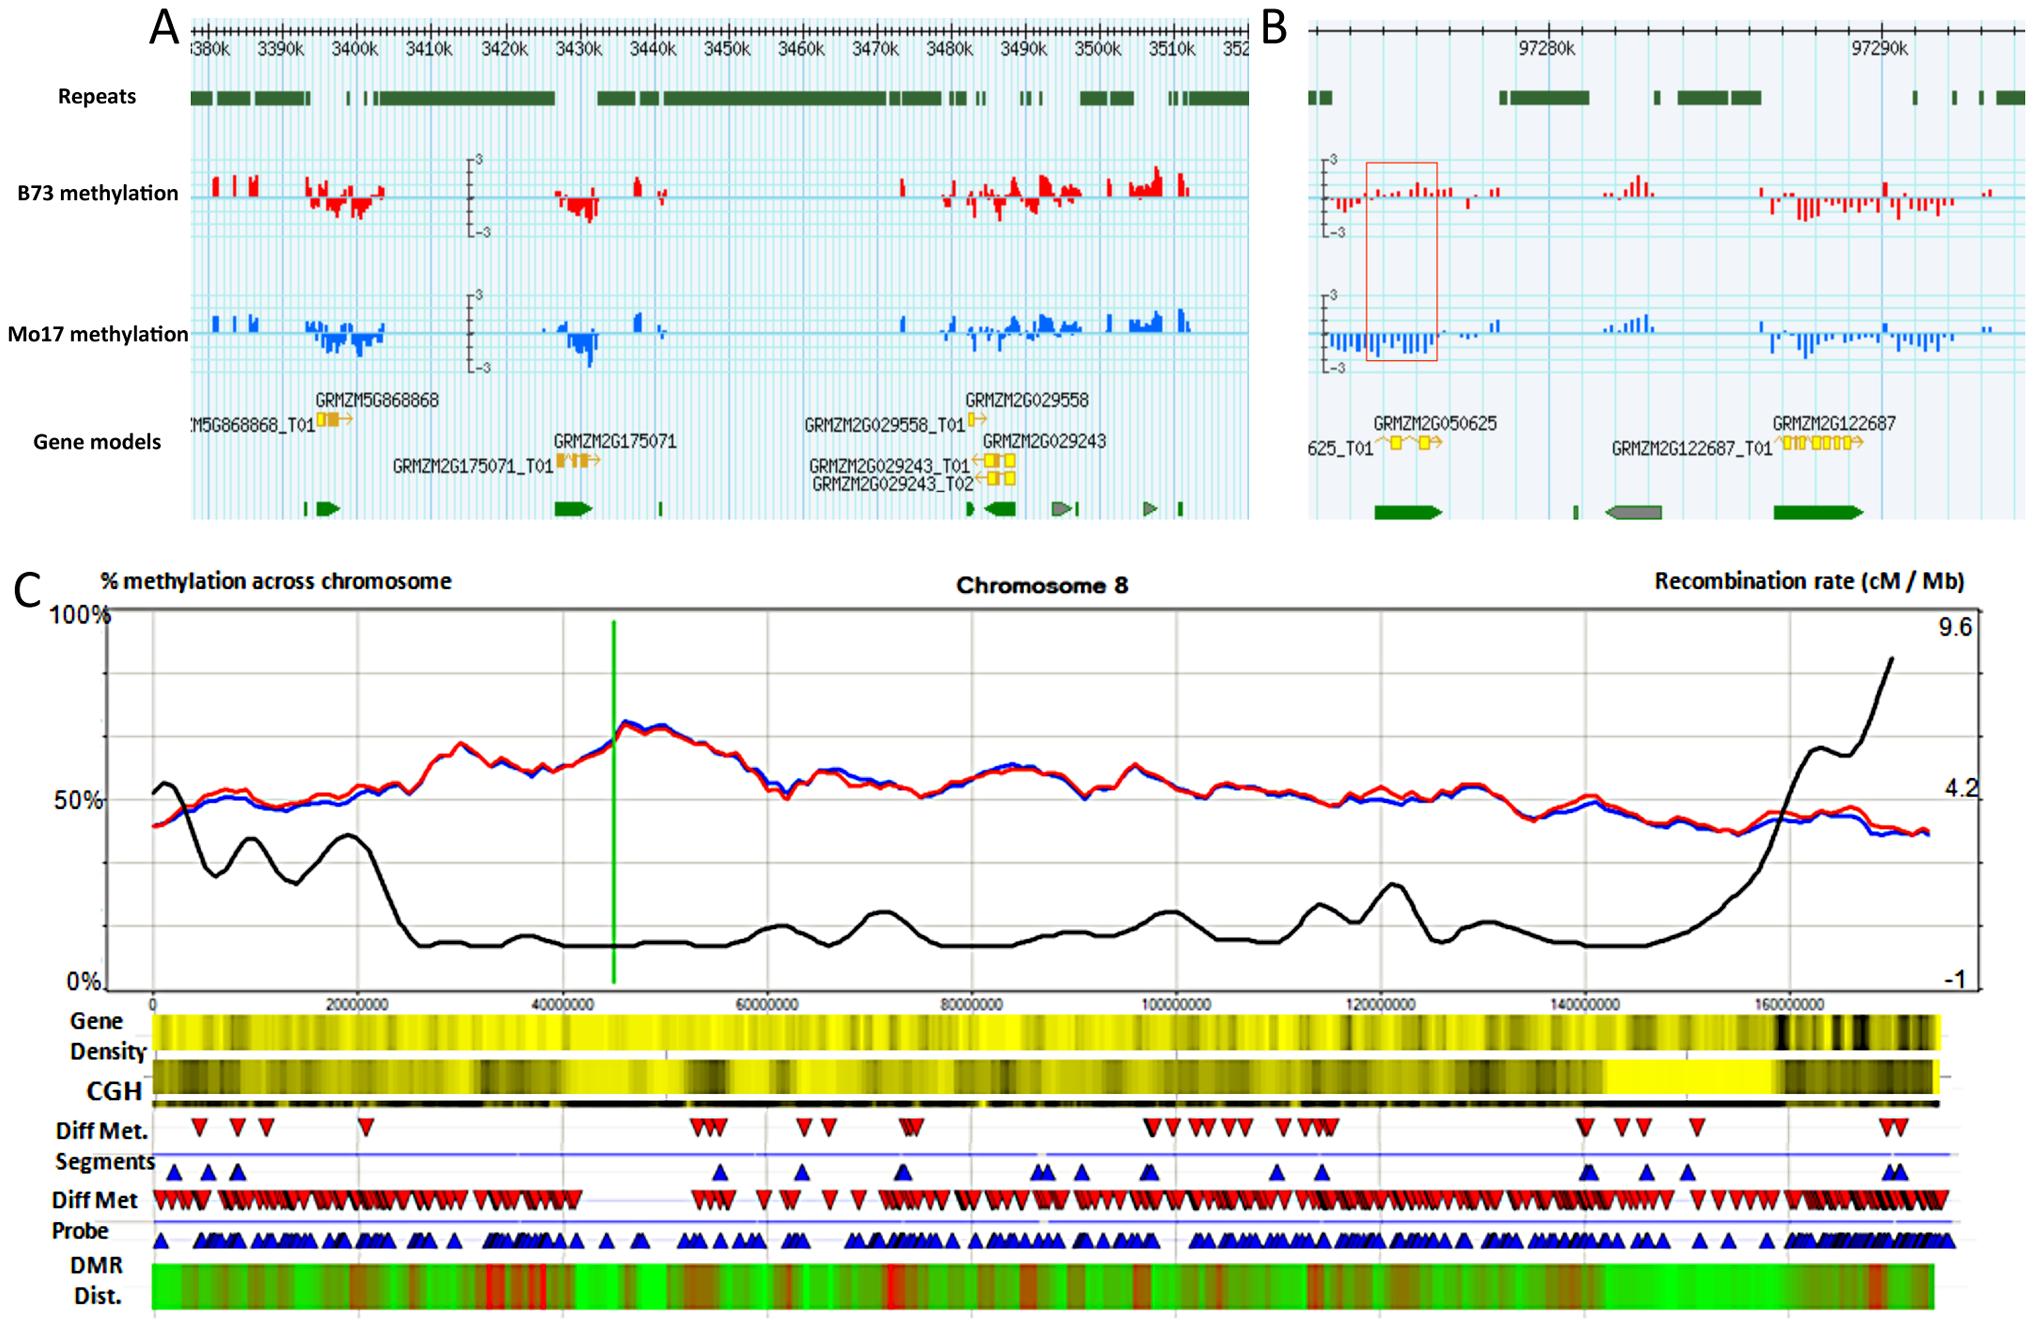 Synopsis of chromosome-level methylation and variation.